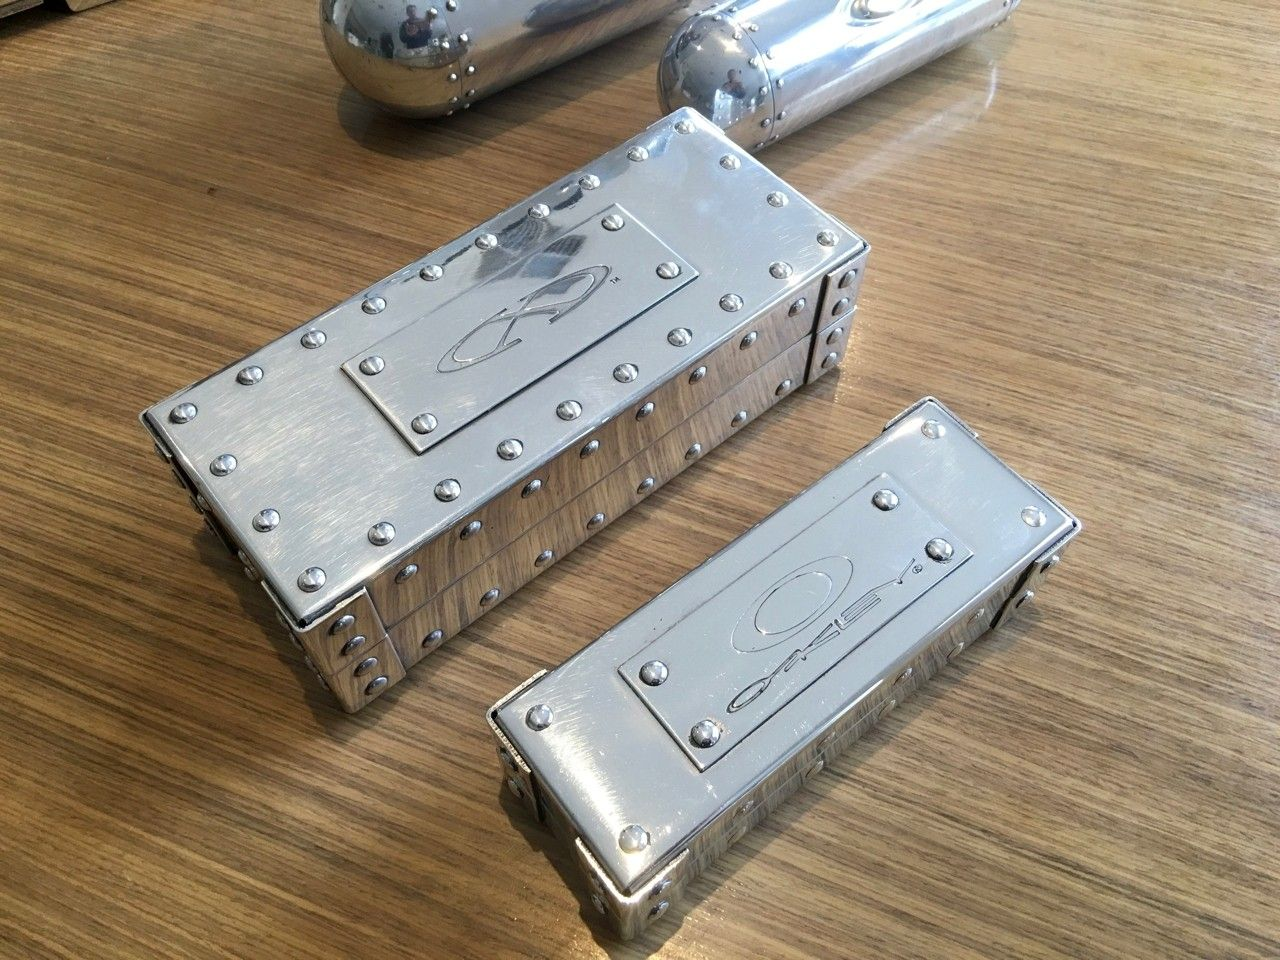 Polished Rep Briefcase & Vaults - Polished Case - 3.jpg